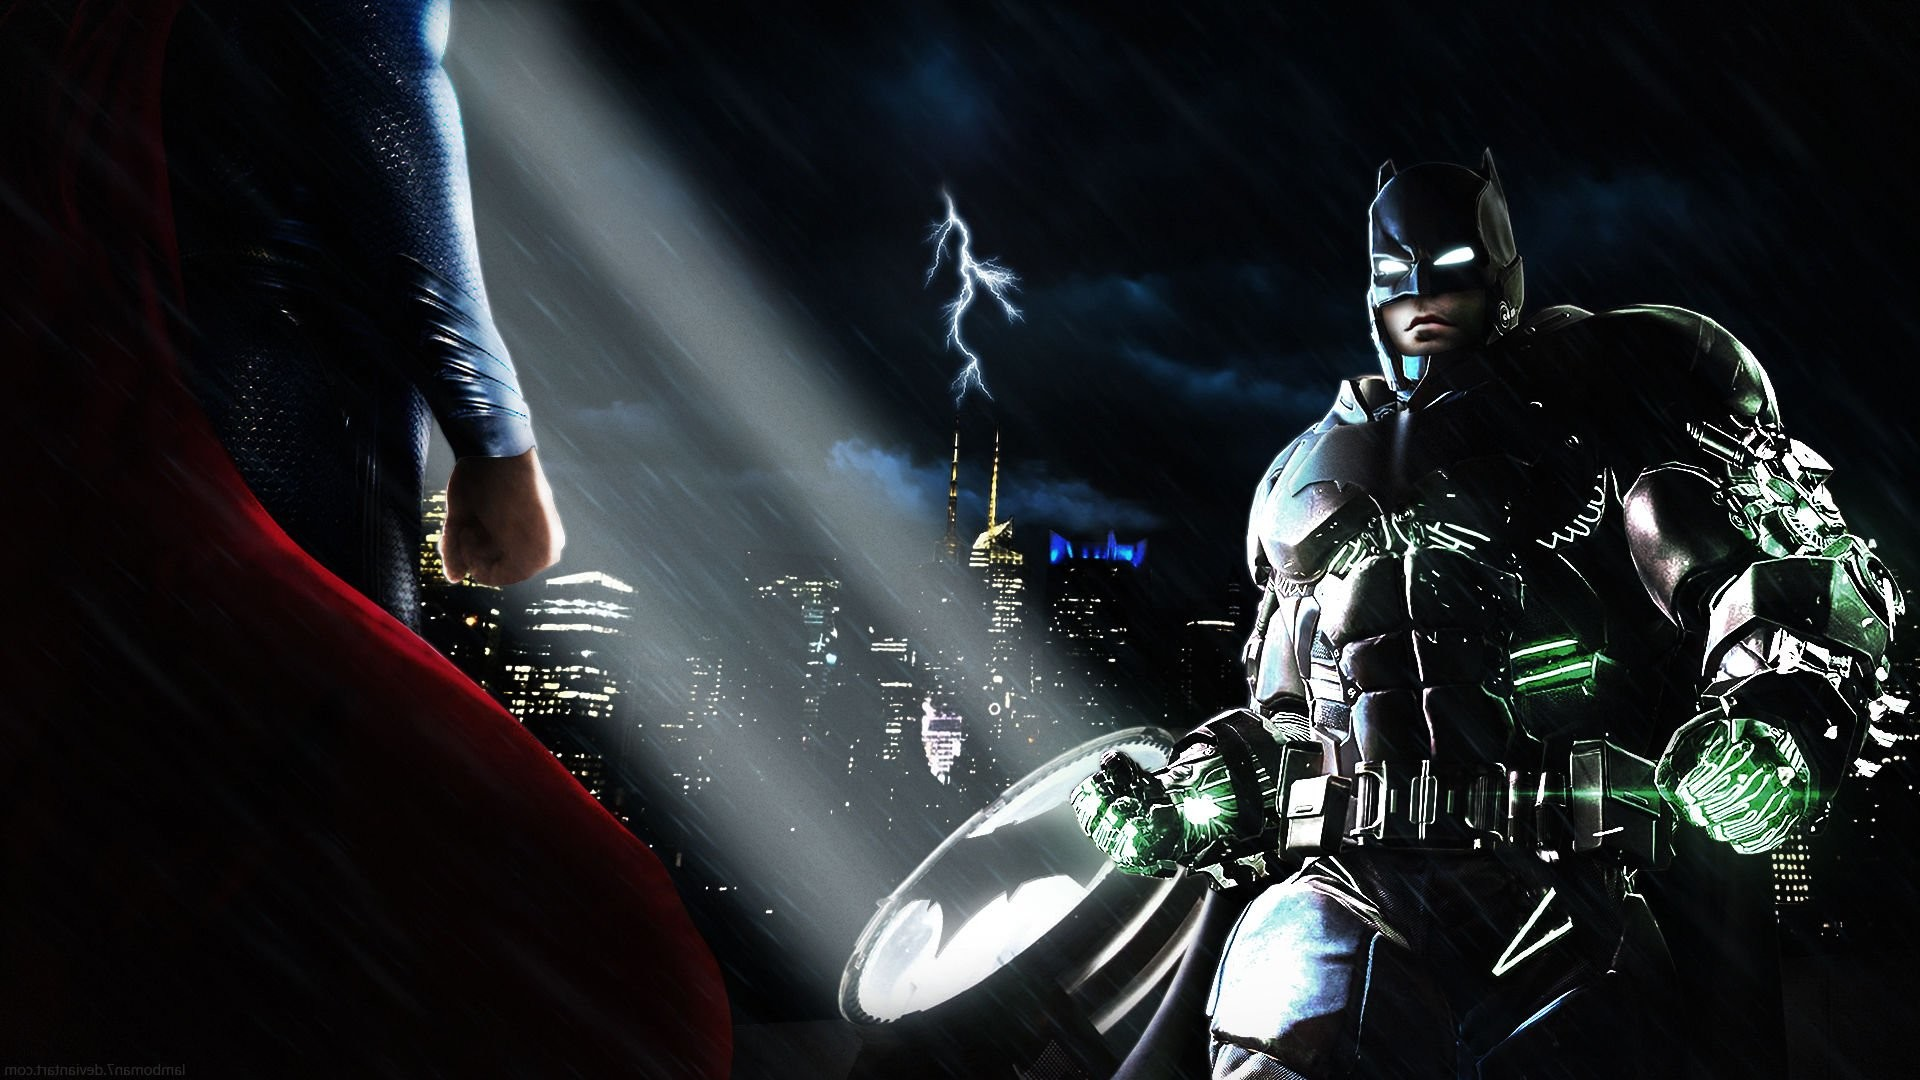 superman dawn justice wallpaper     497091   WallpaperUP .